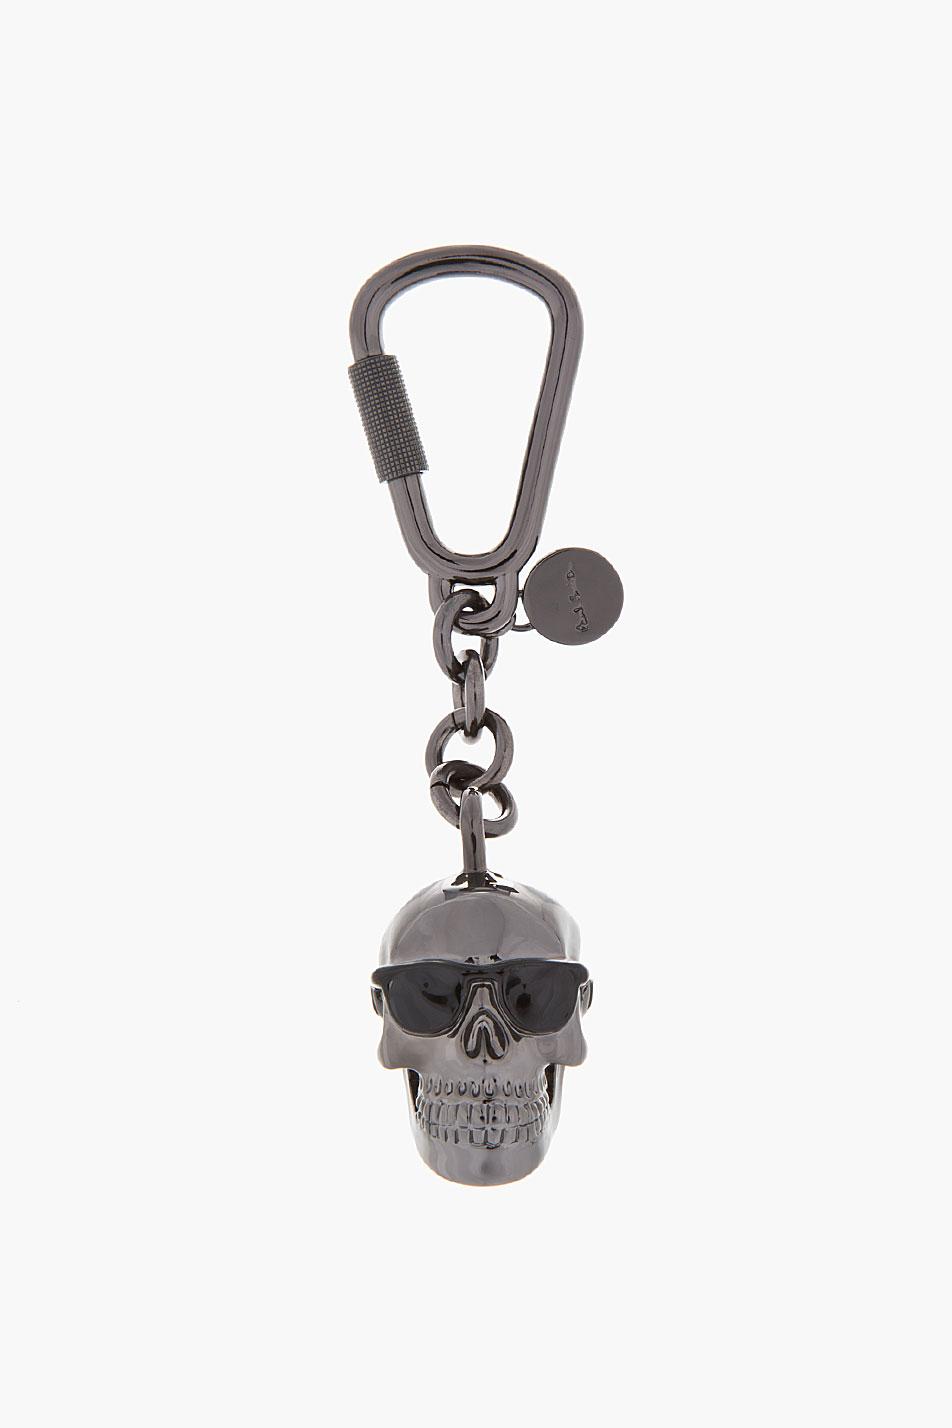 Paul Smith Black Brass Dressed Skull Pendant Keychain In